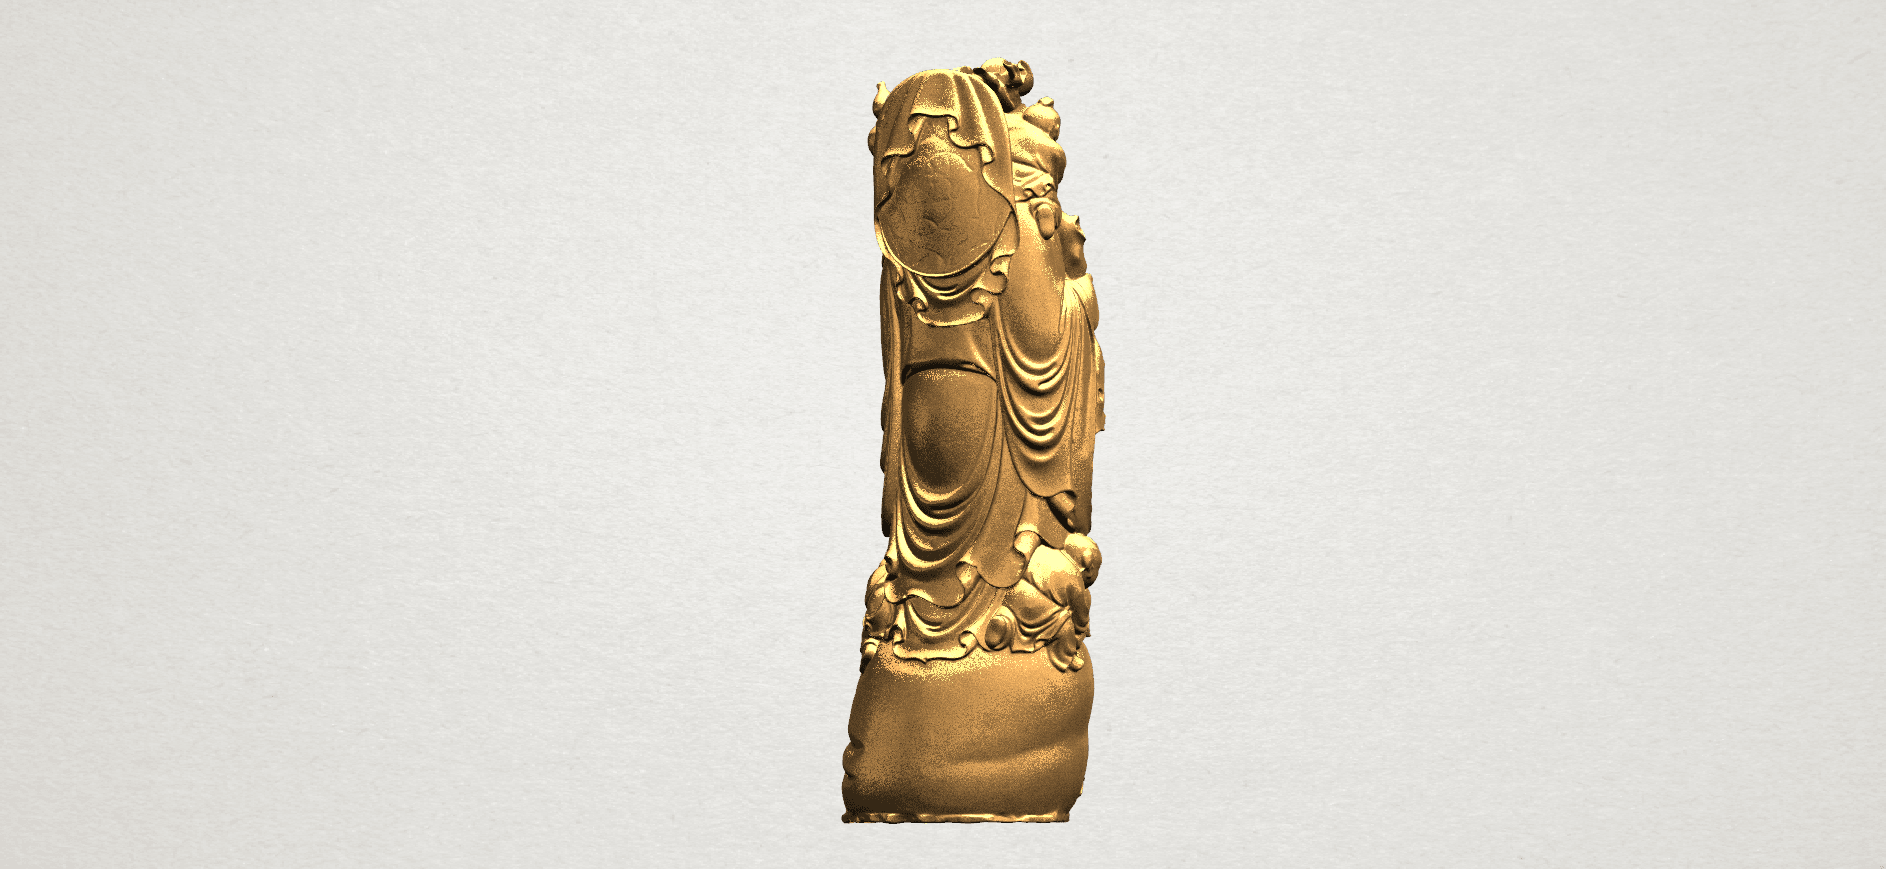 TDA0070 Metteyya Buddha 02 - 88mm - A05.png Download free STL file Metteyya Buddha 02 • 3D printer object, GeorgesNikkei